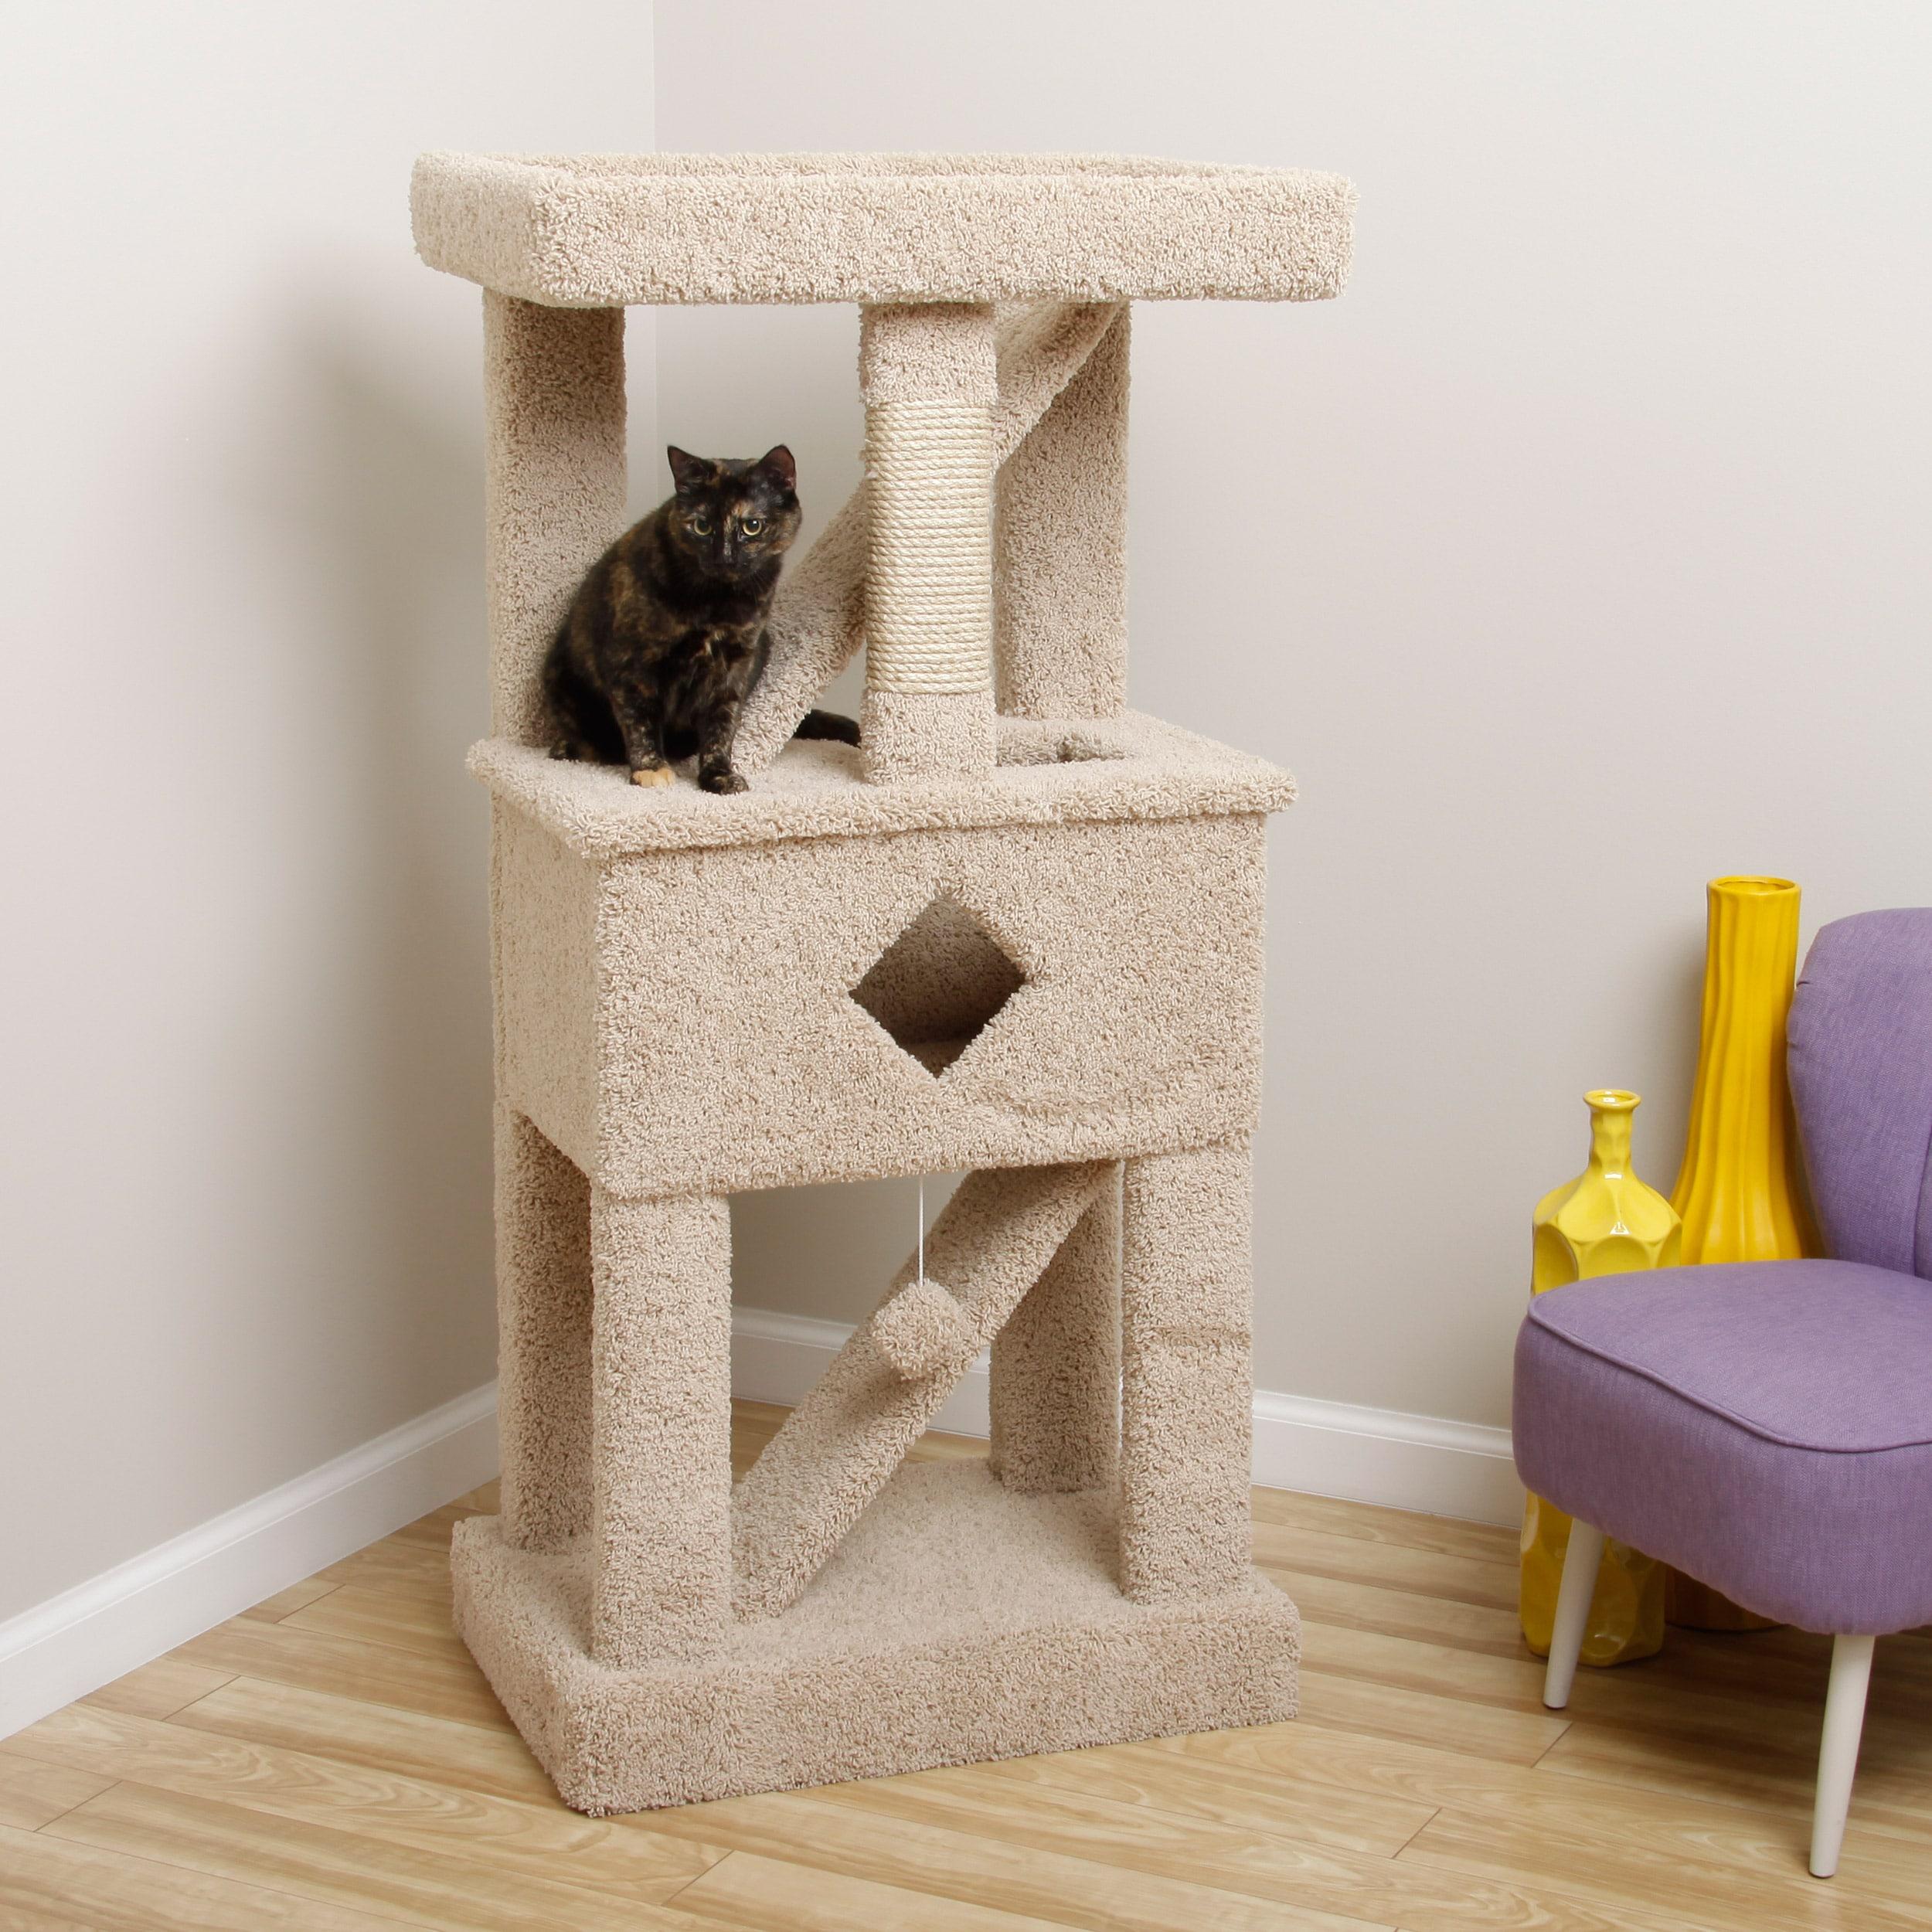 new cat condos large play gym cat tree  free shipping today  - new cat condos large play gym cat tree  free shipping today overstockcom